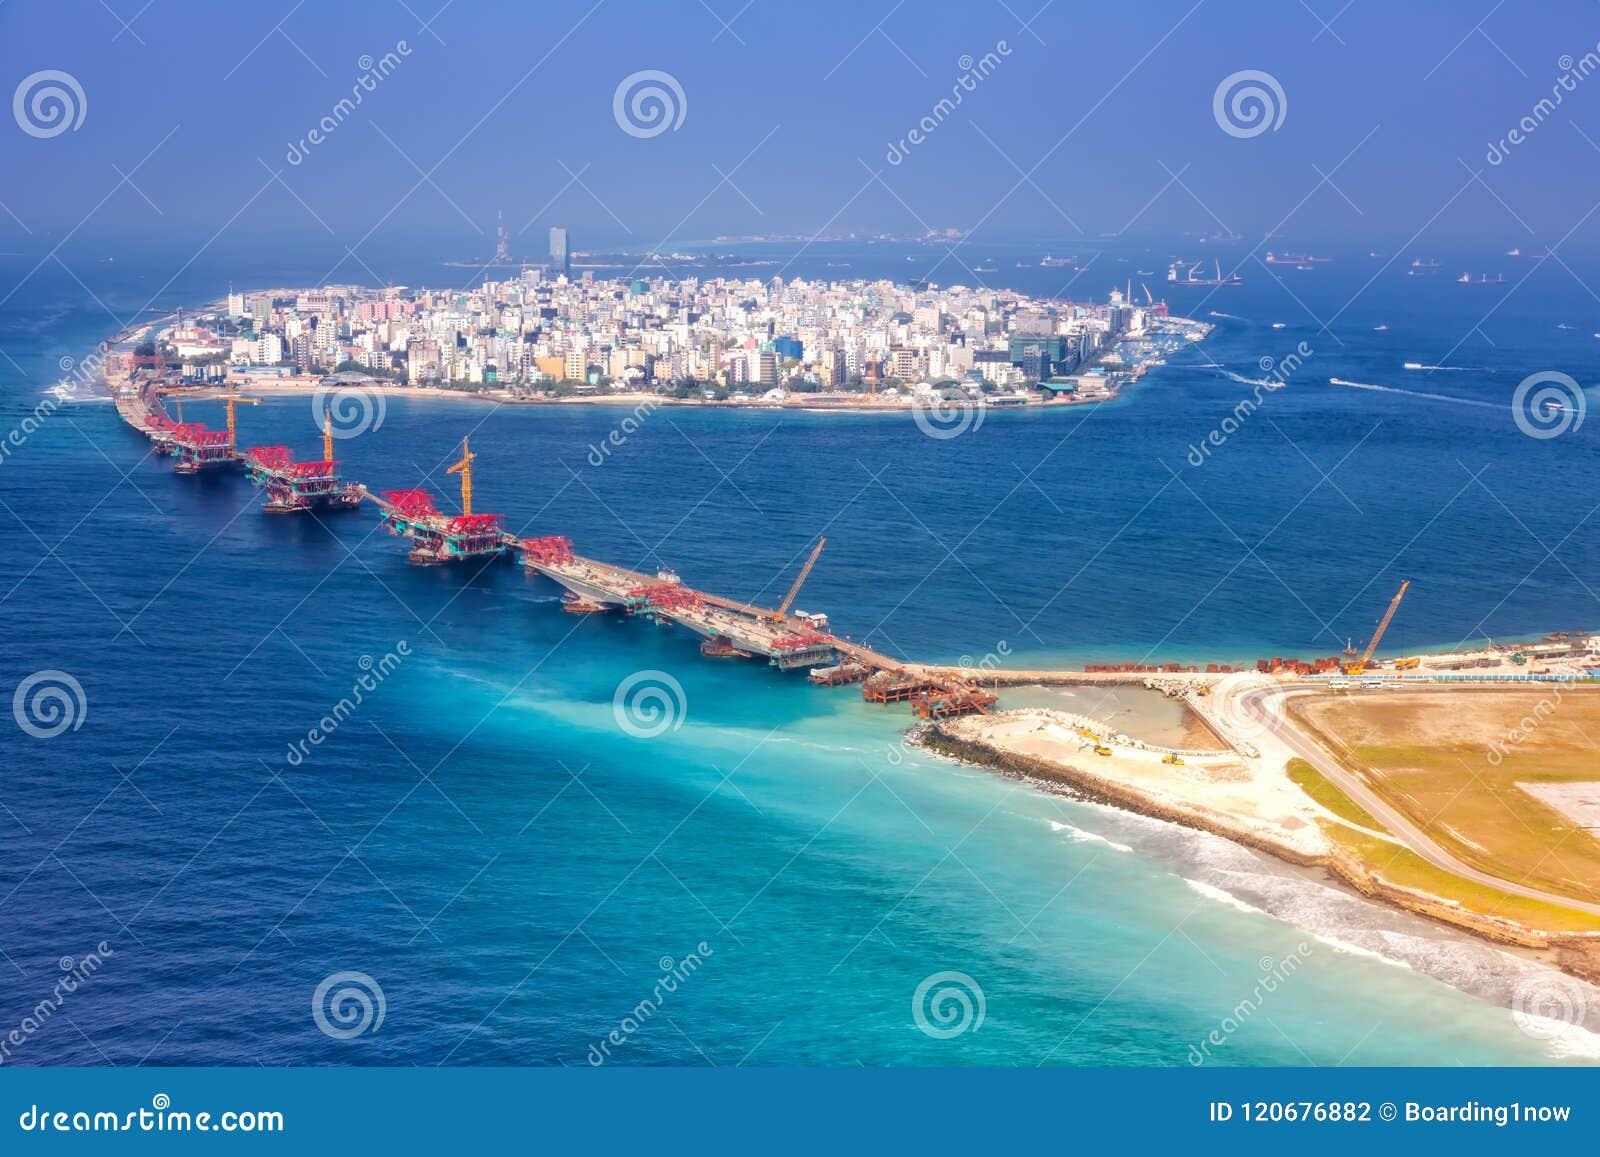 Maldives Male Capital City Island Airport Bridge Aerial